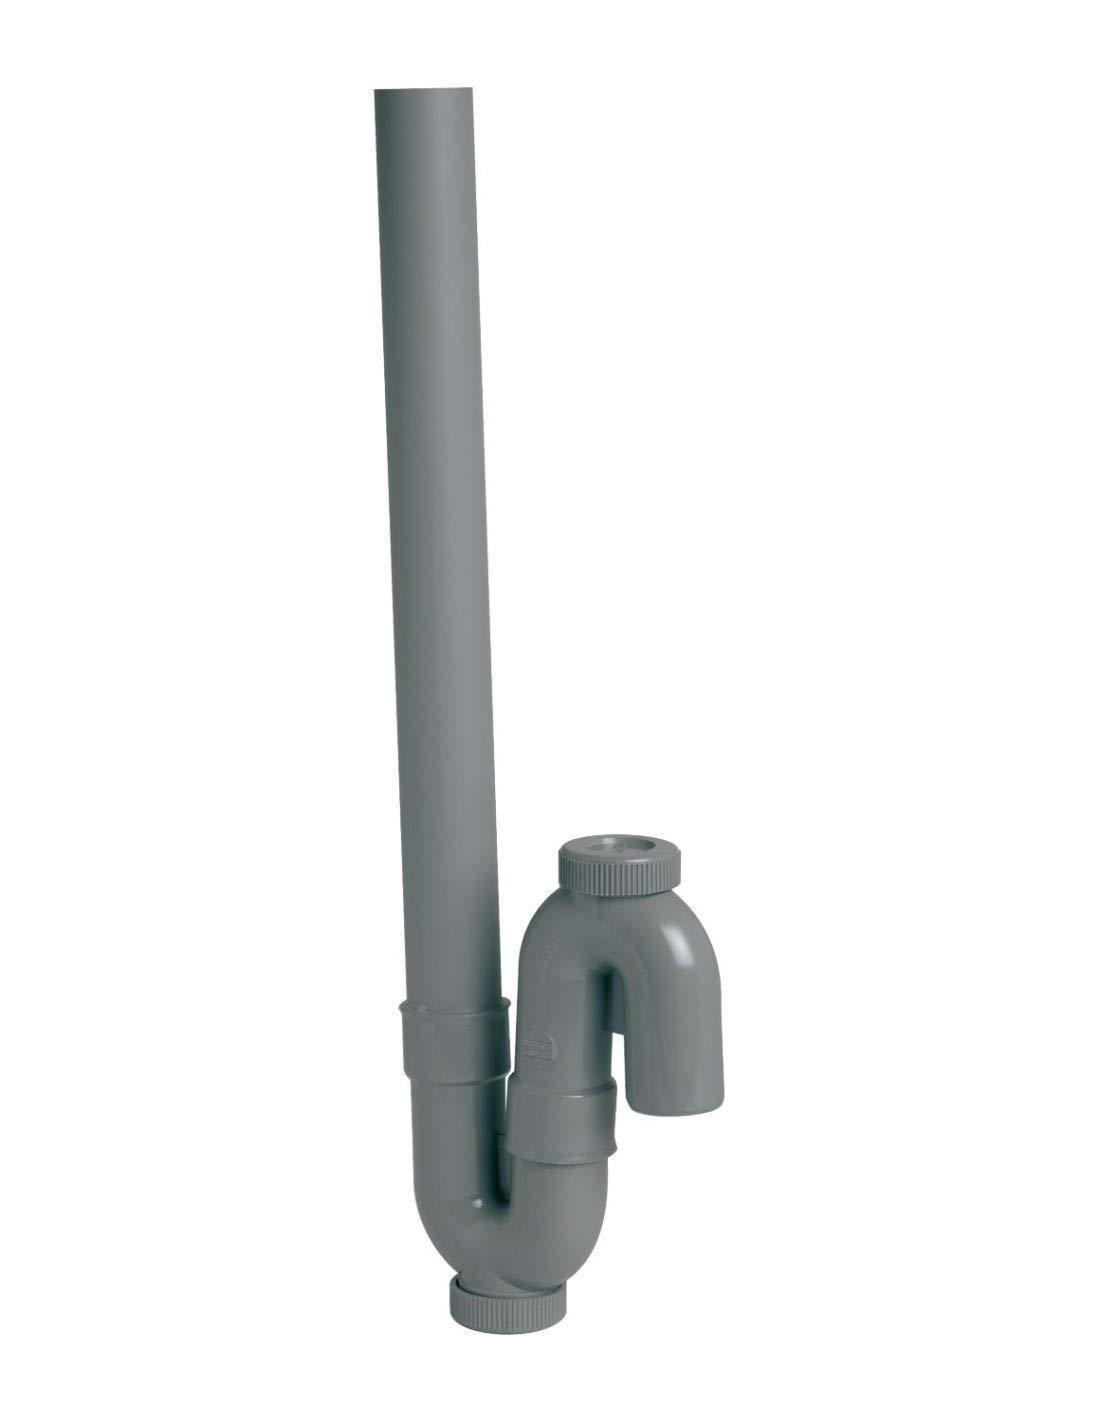 Sifón de lavadora - Simple - Salida vertical - diámetro 40 mm ...